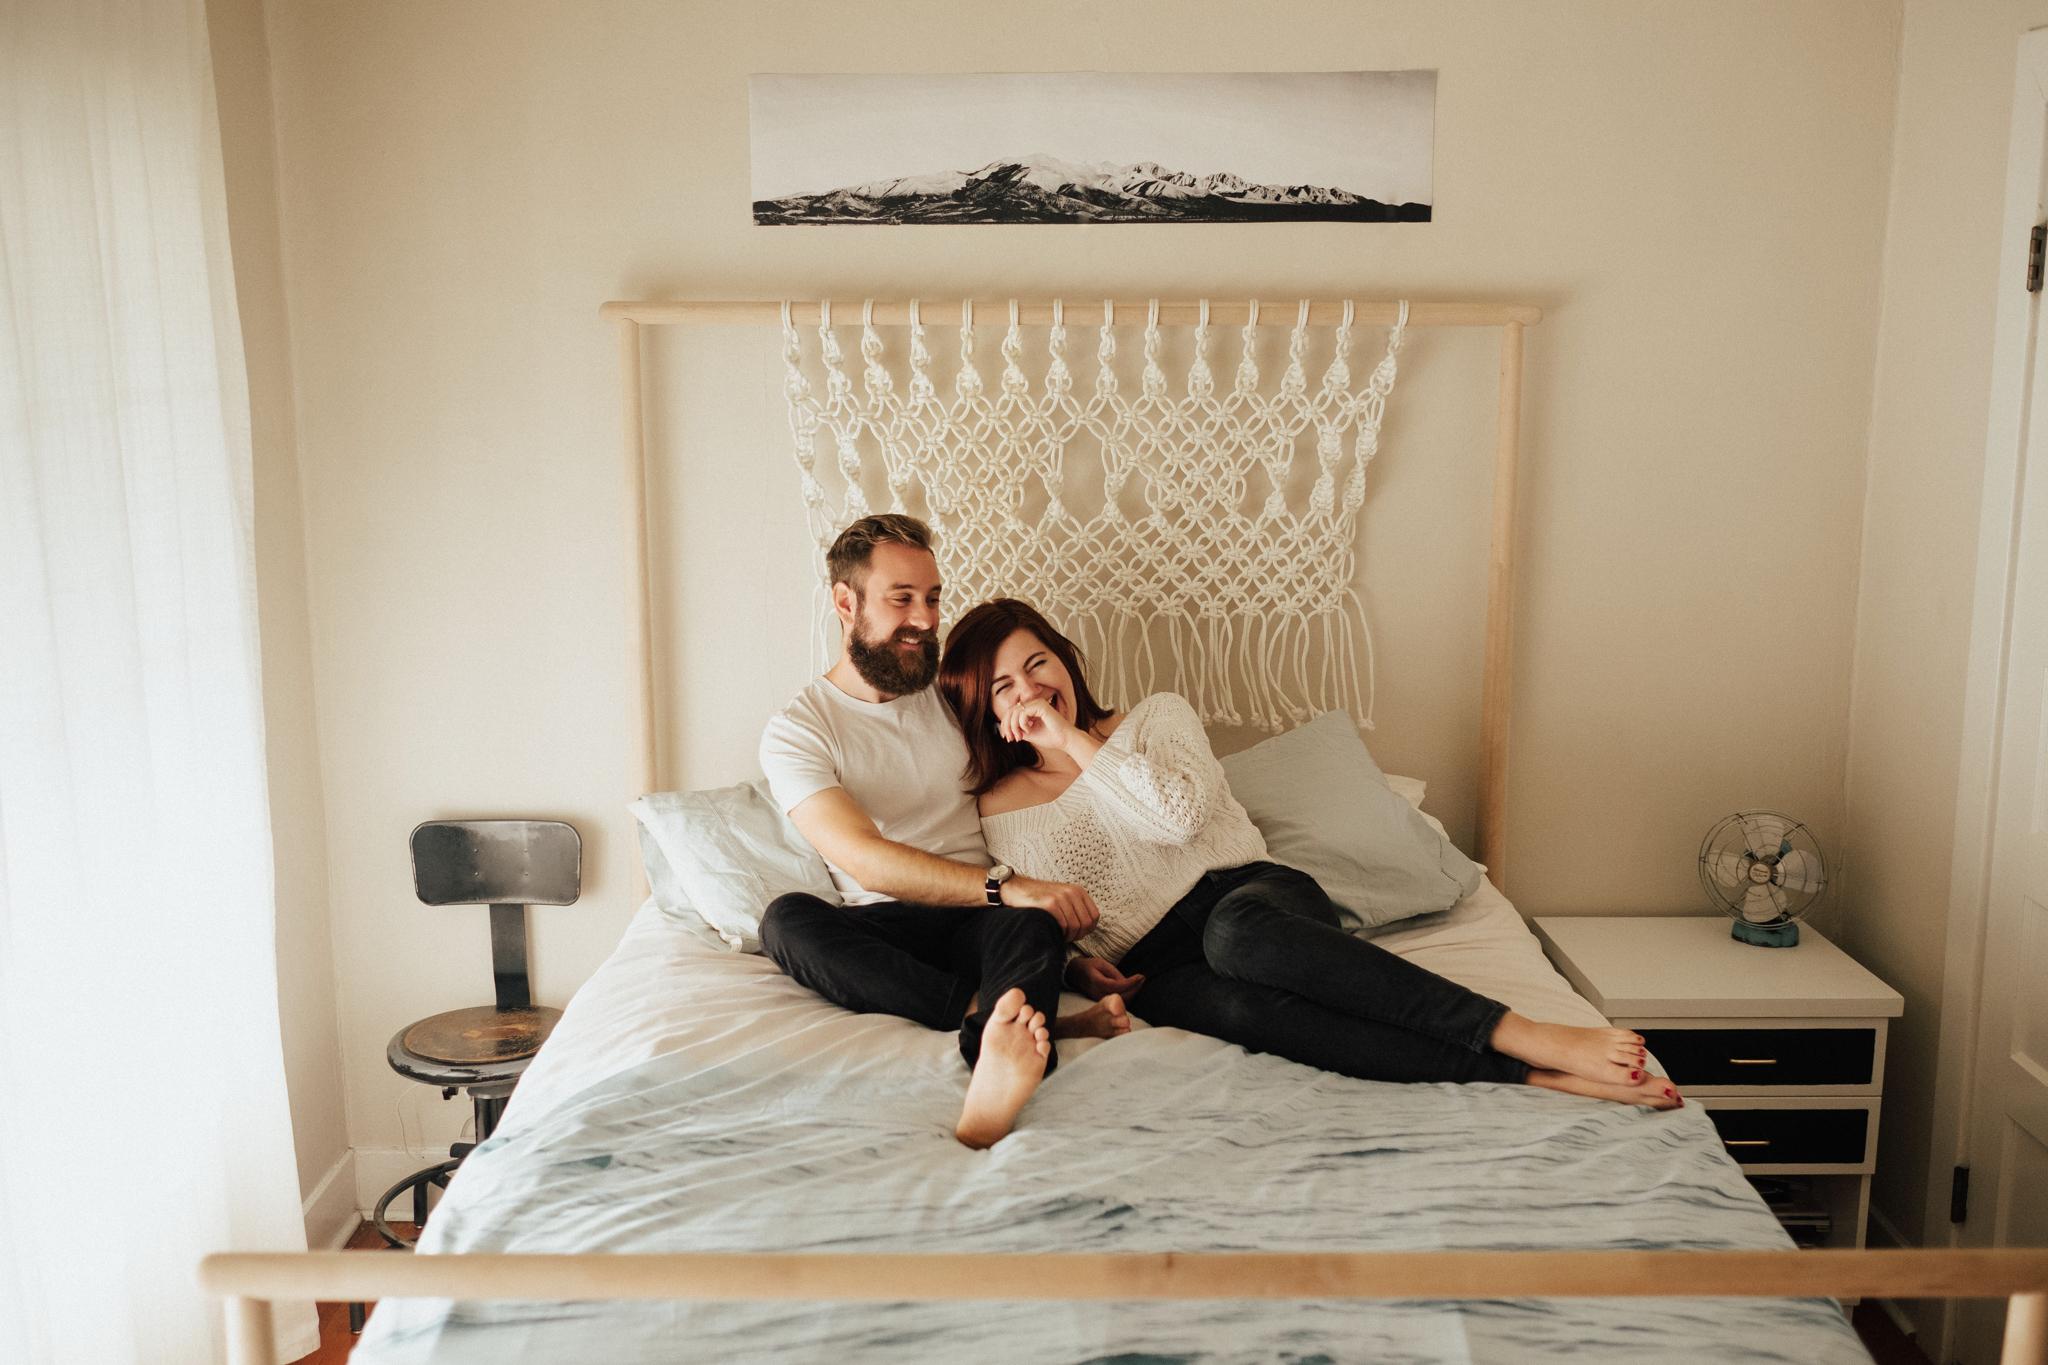 Arizona-Adventure-Elopement-Wedding-Photographer-2.jpg